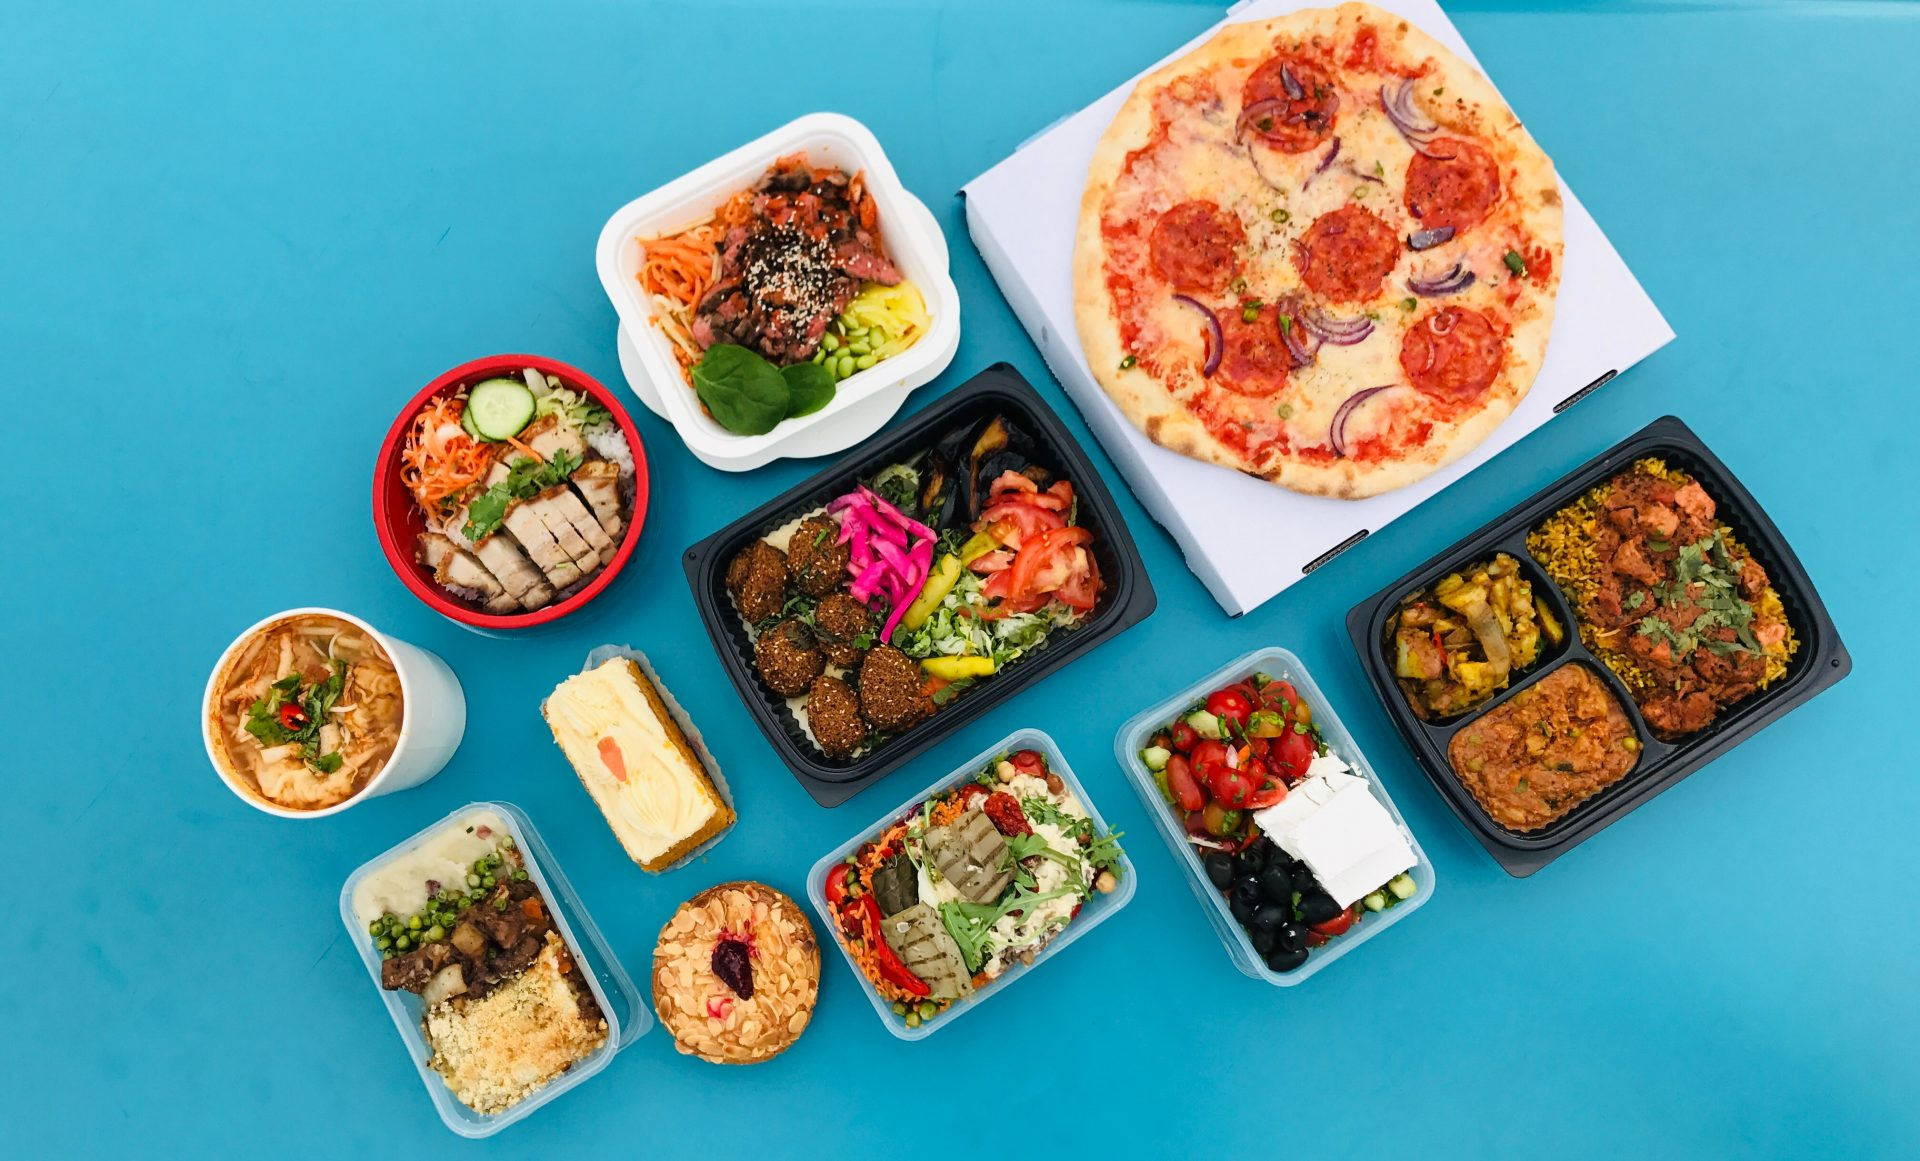 Die 2-Kilo-Regel: Wie Du Fett abbaust, indem Du Dich satt isst